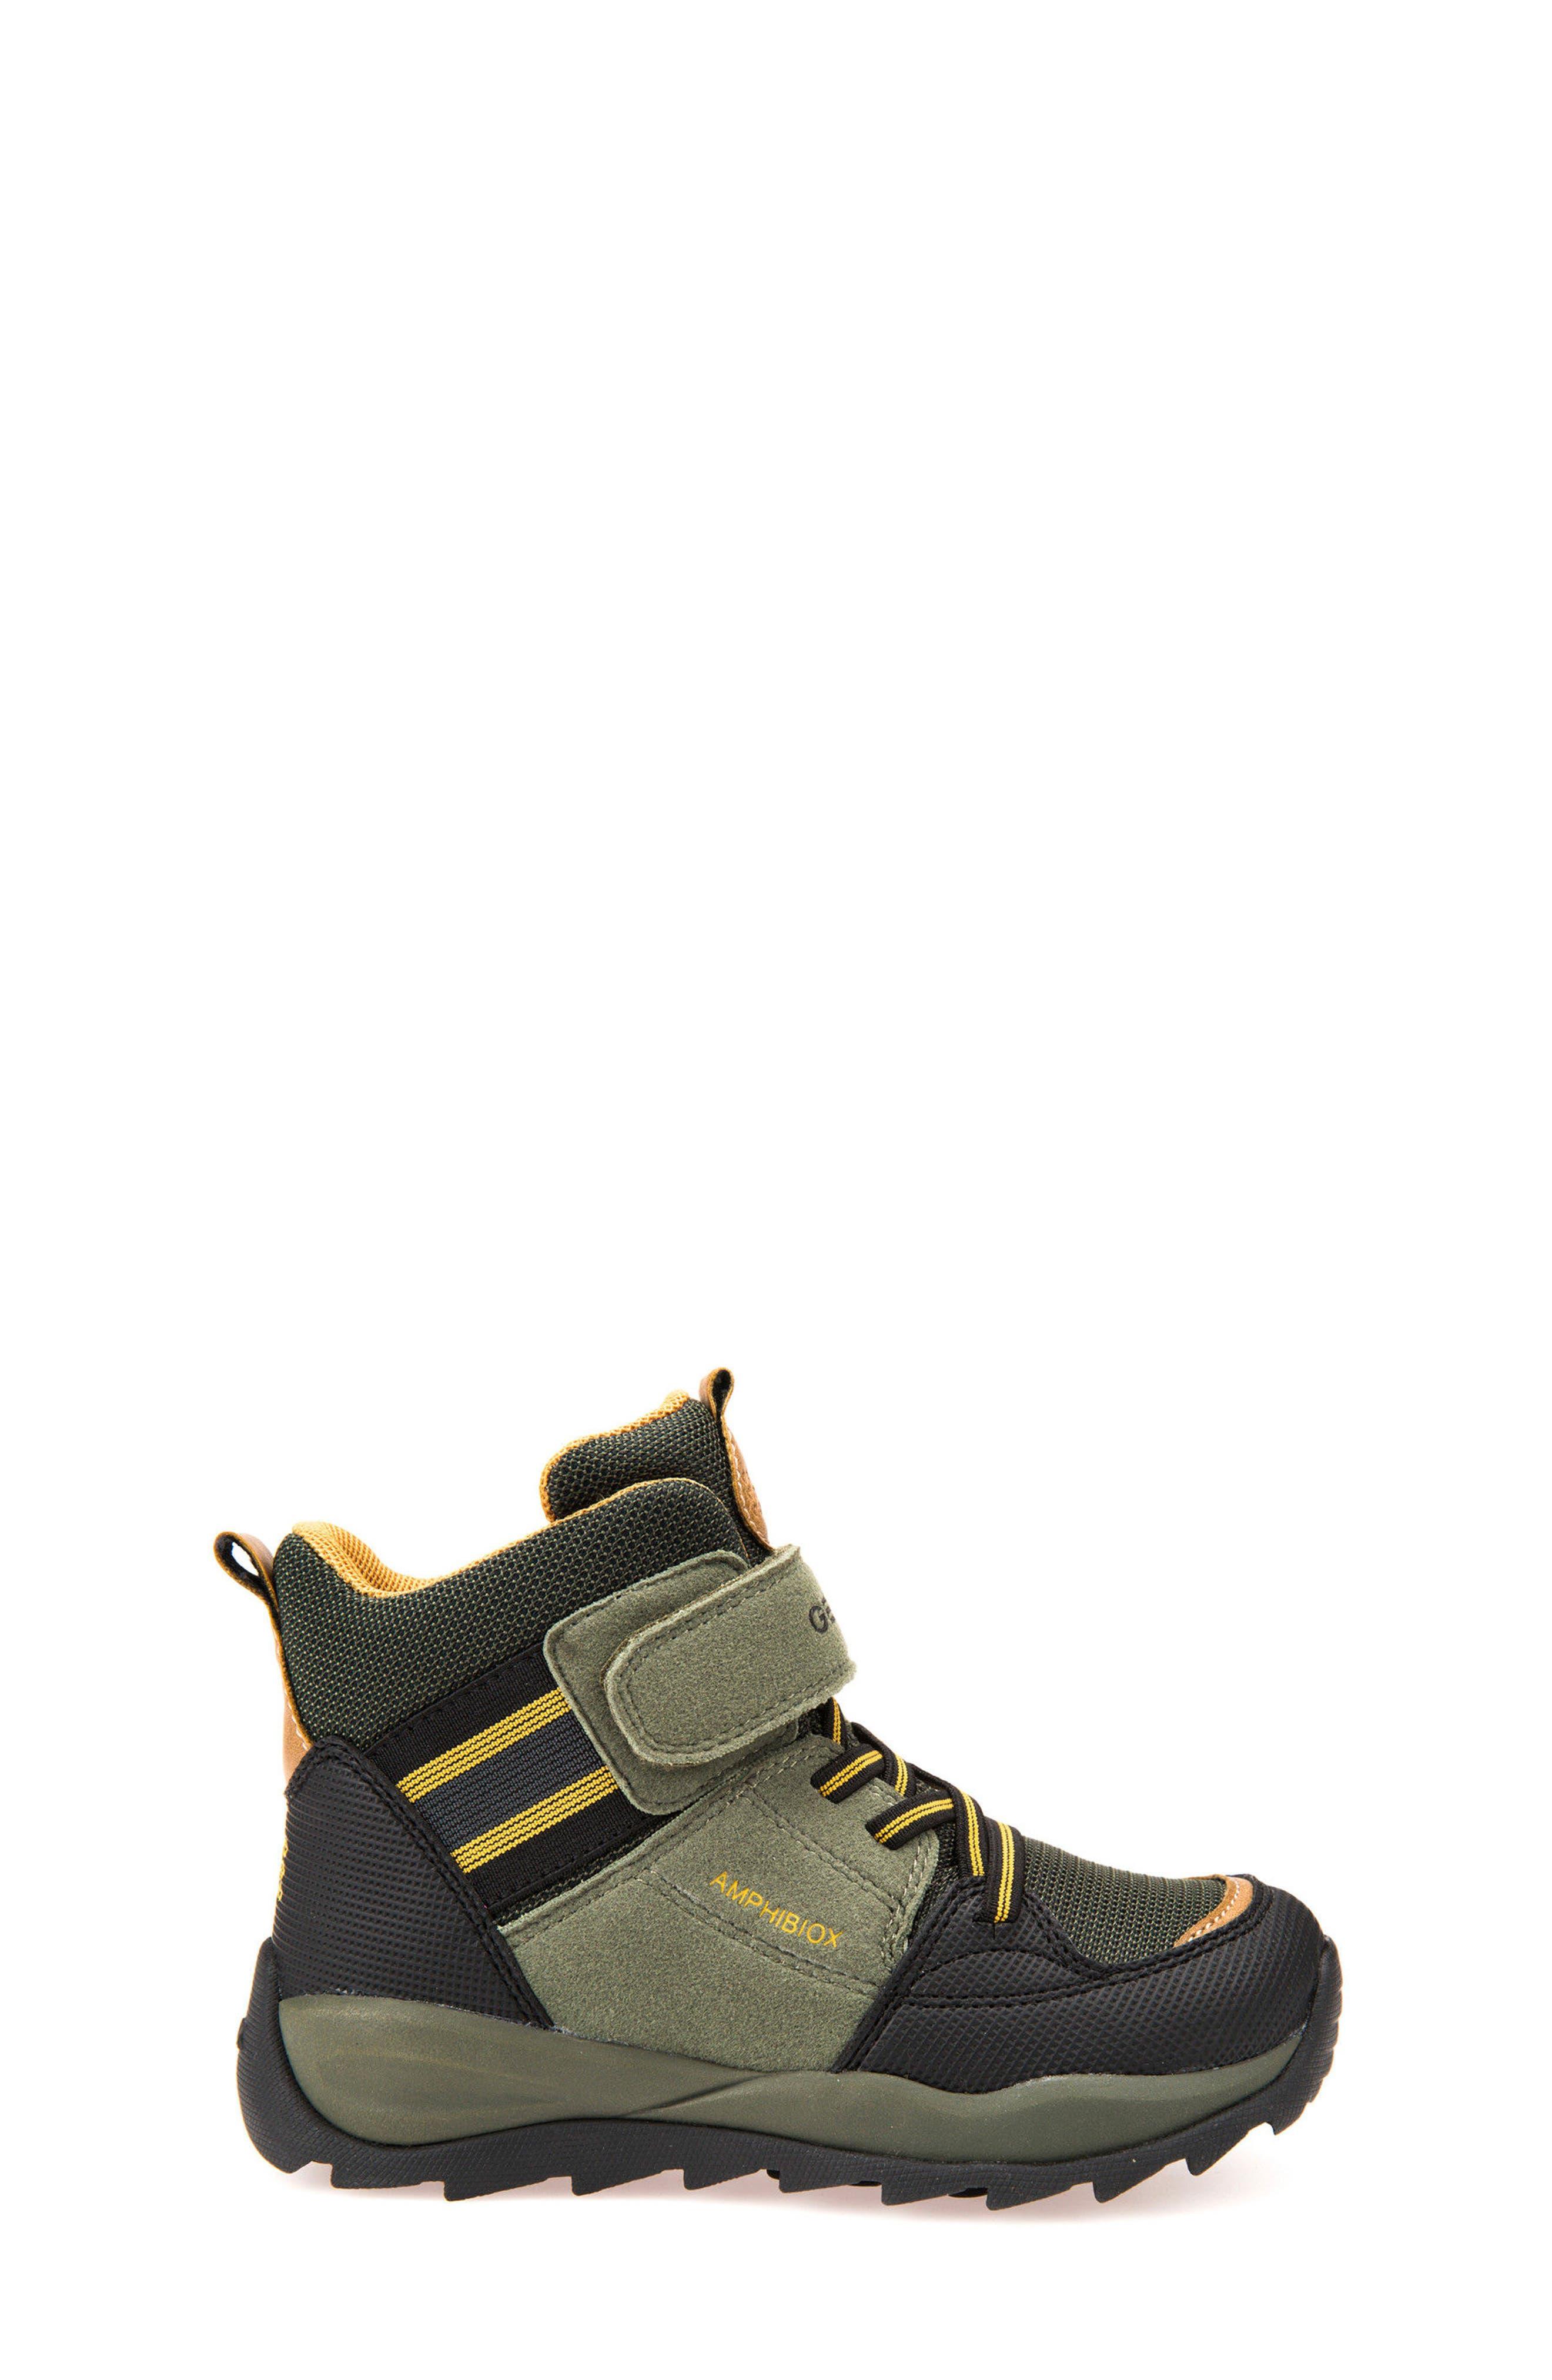 Alternate Image 3  - Geox Orizont ABX Waterproof Boot (Toddler, Little Kid & Big Kid)